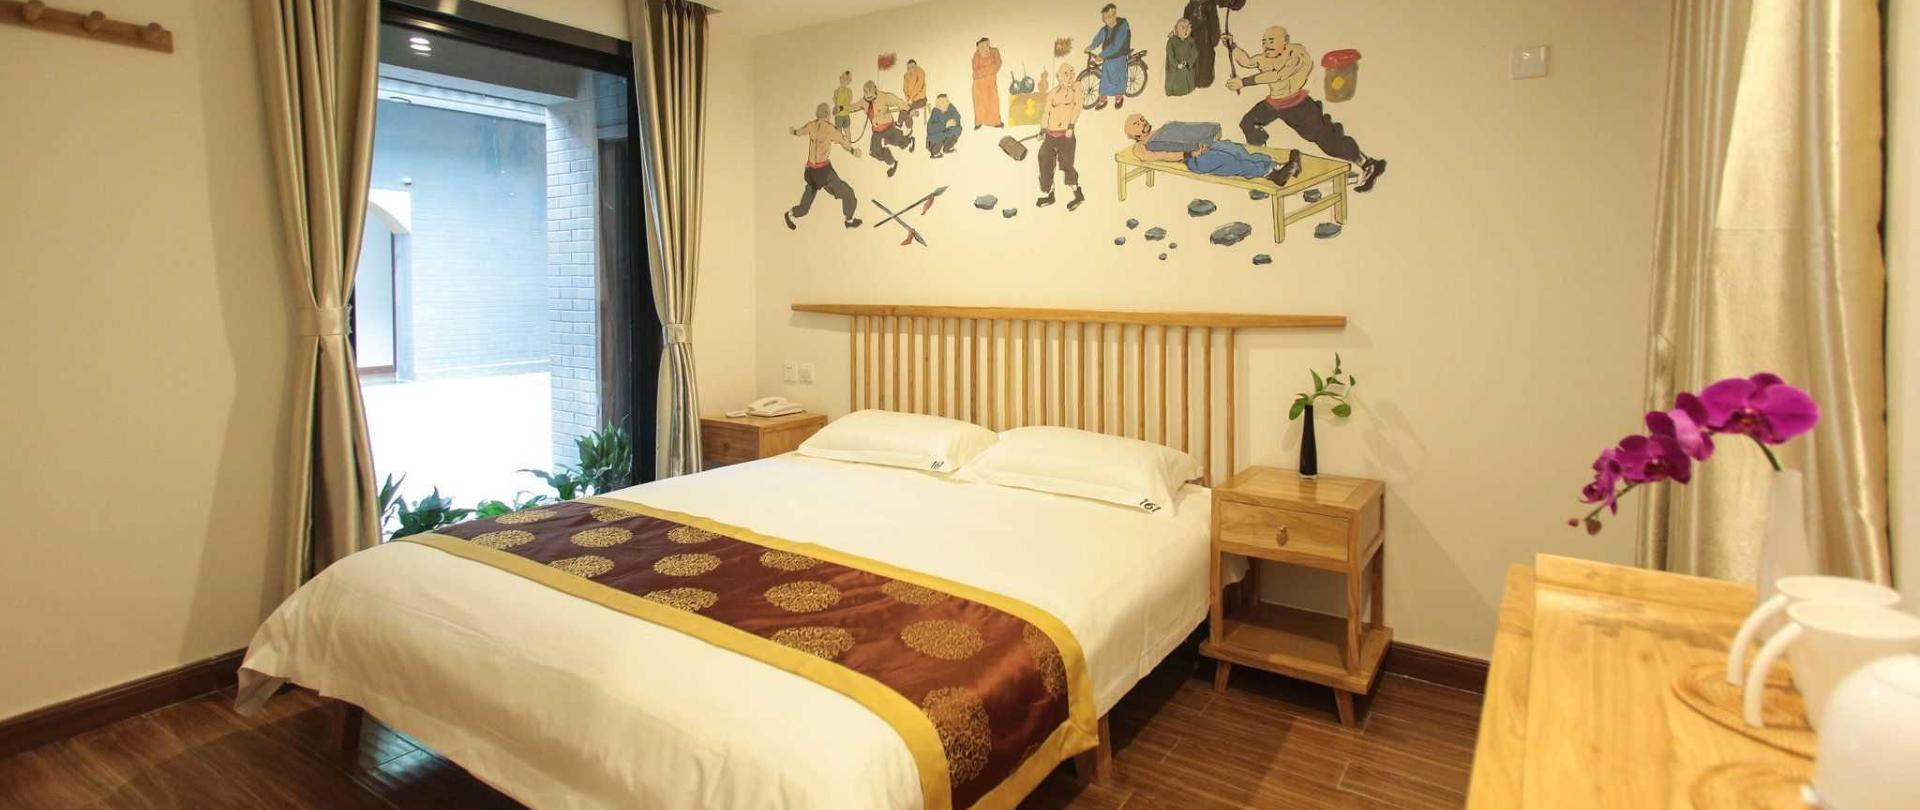 wfj2-king-room04-1.jpg